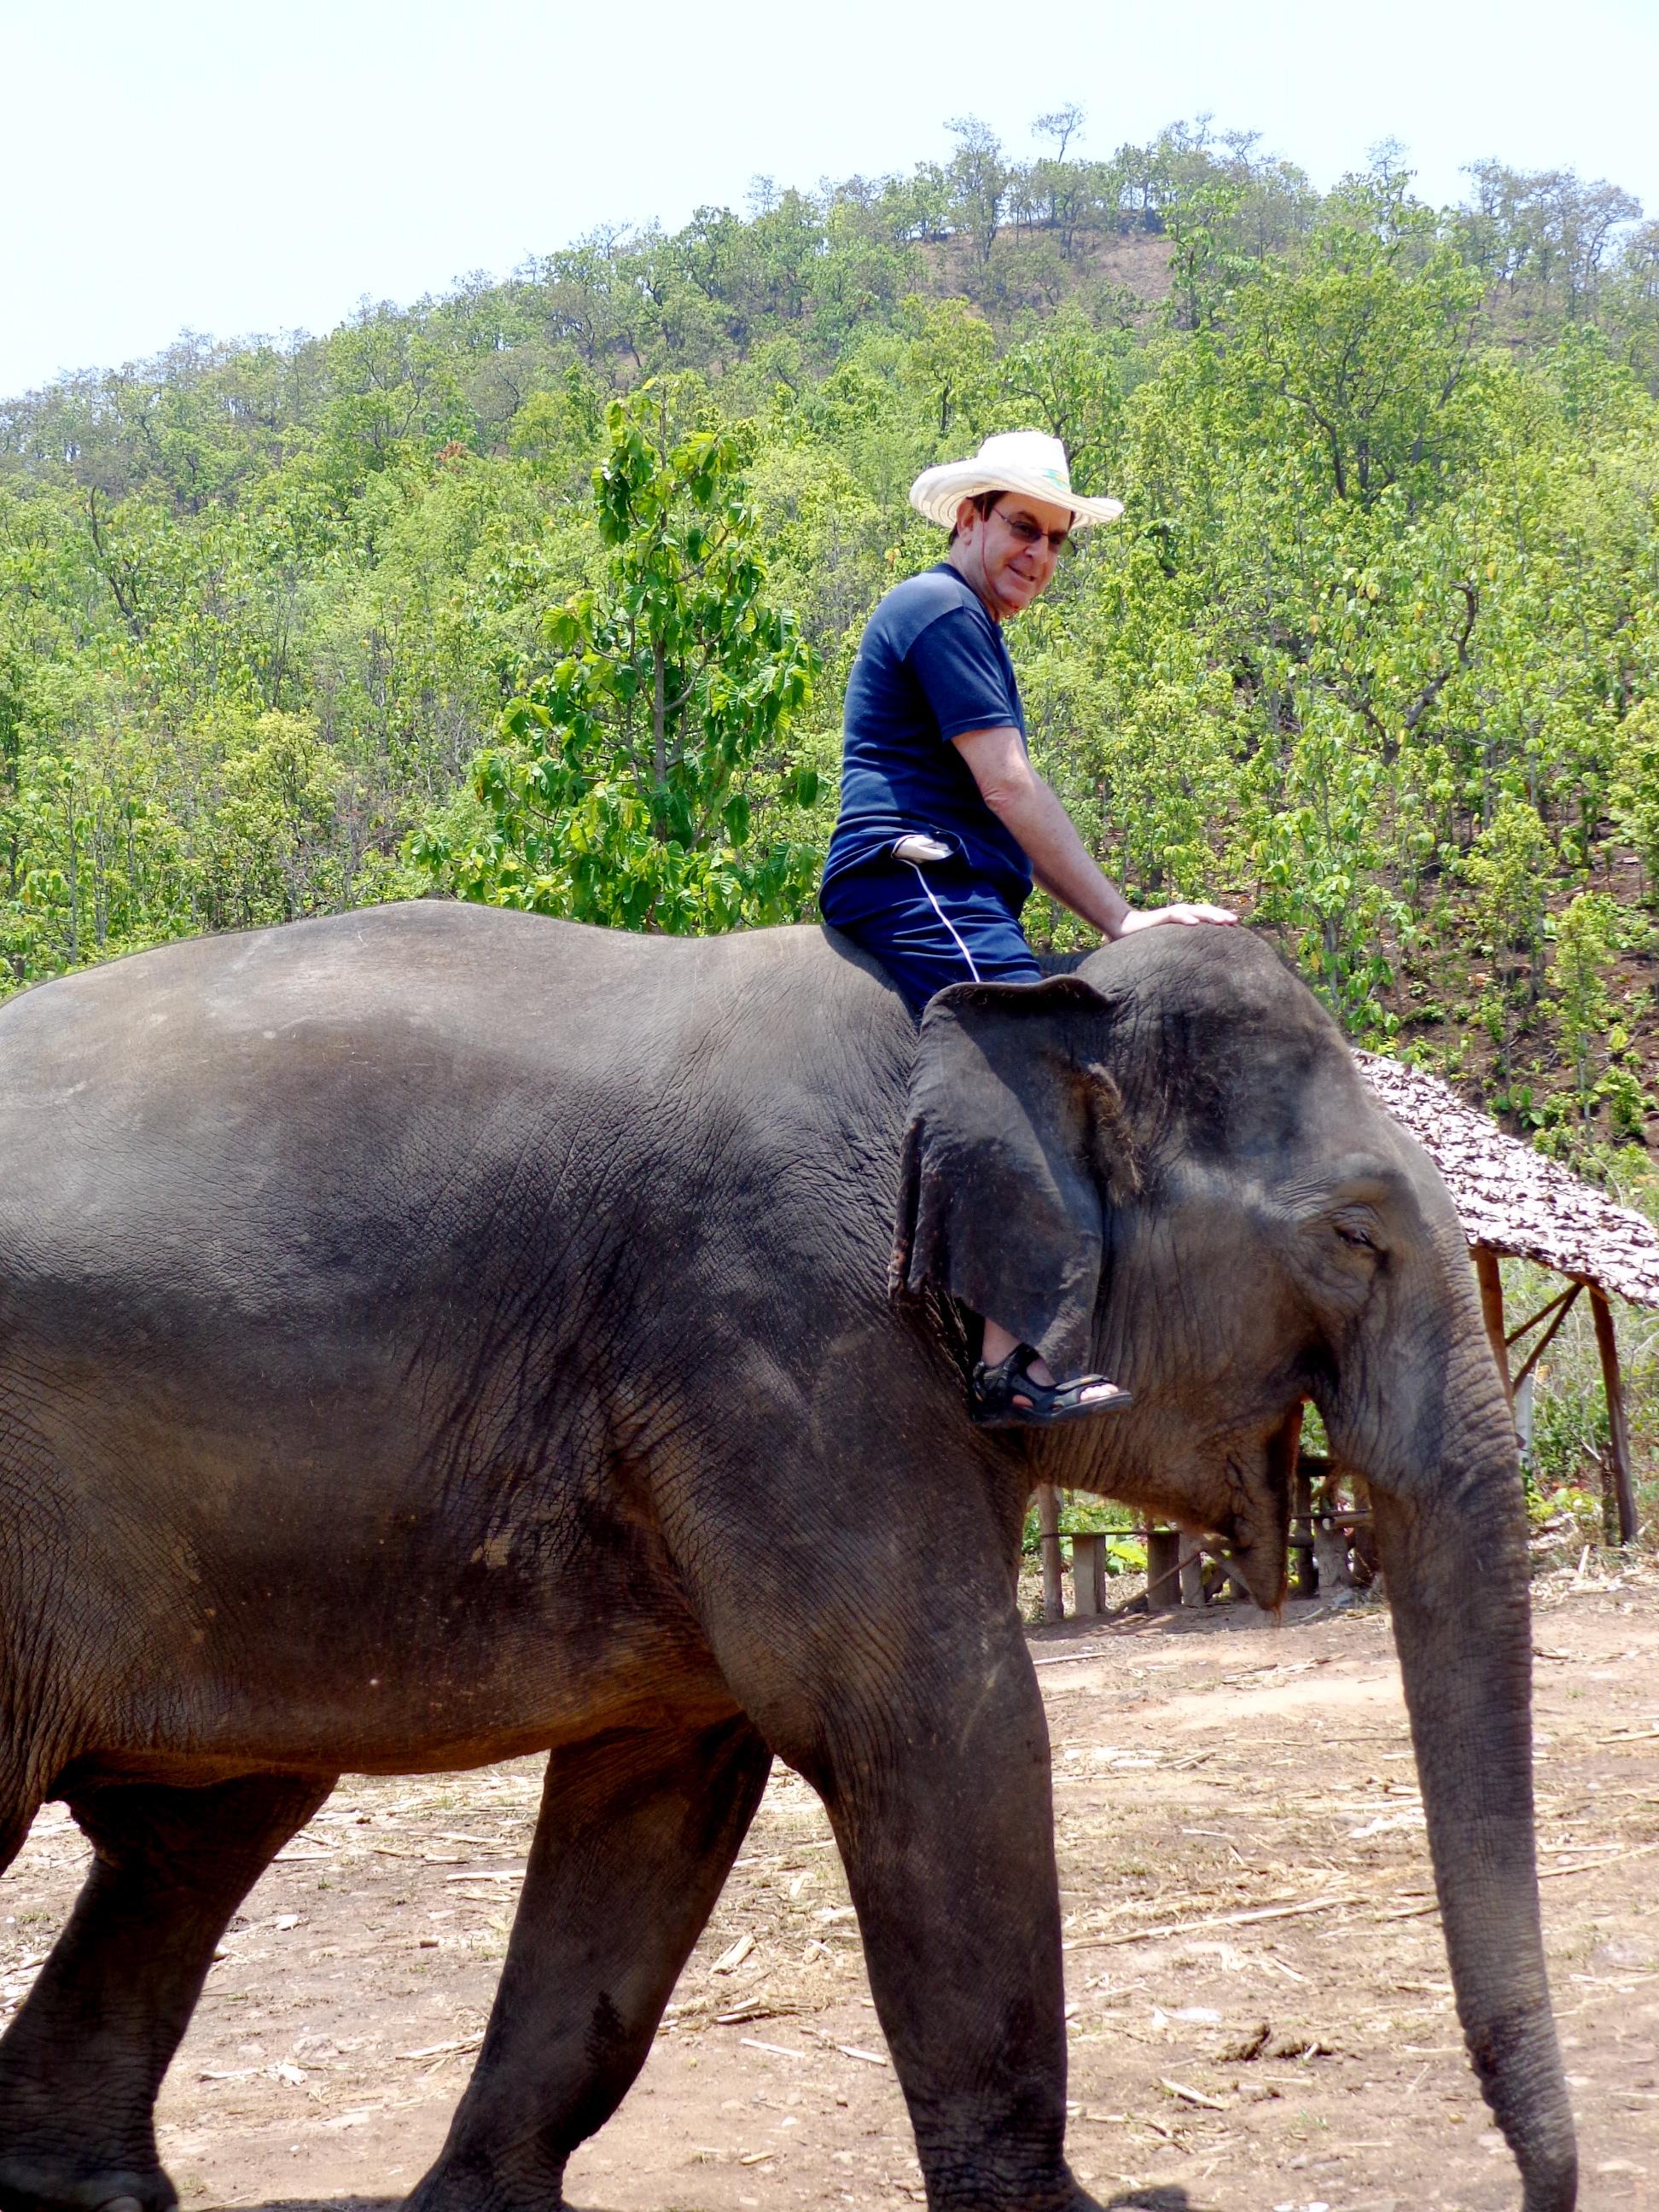 Daveo riding an elephant